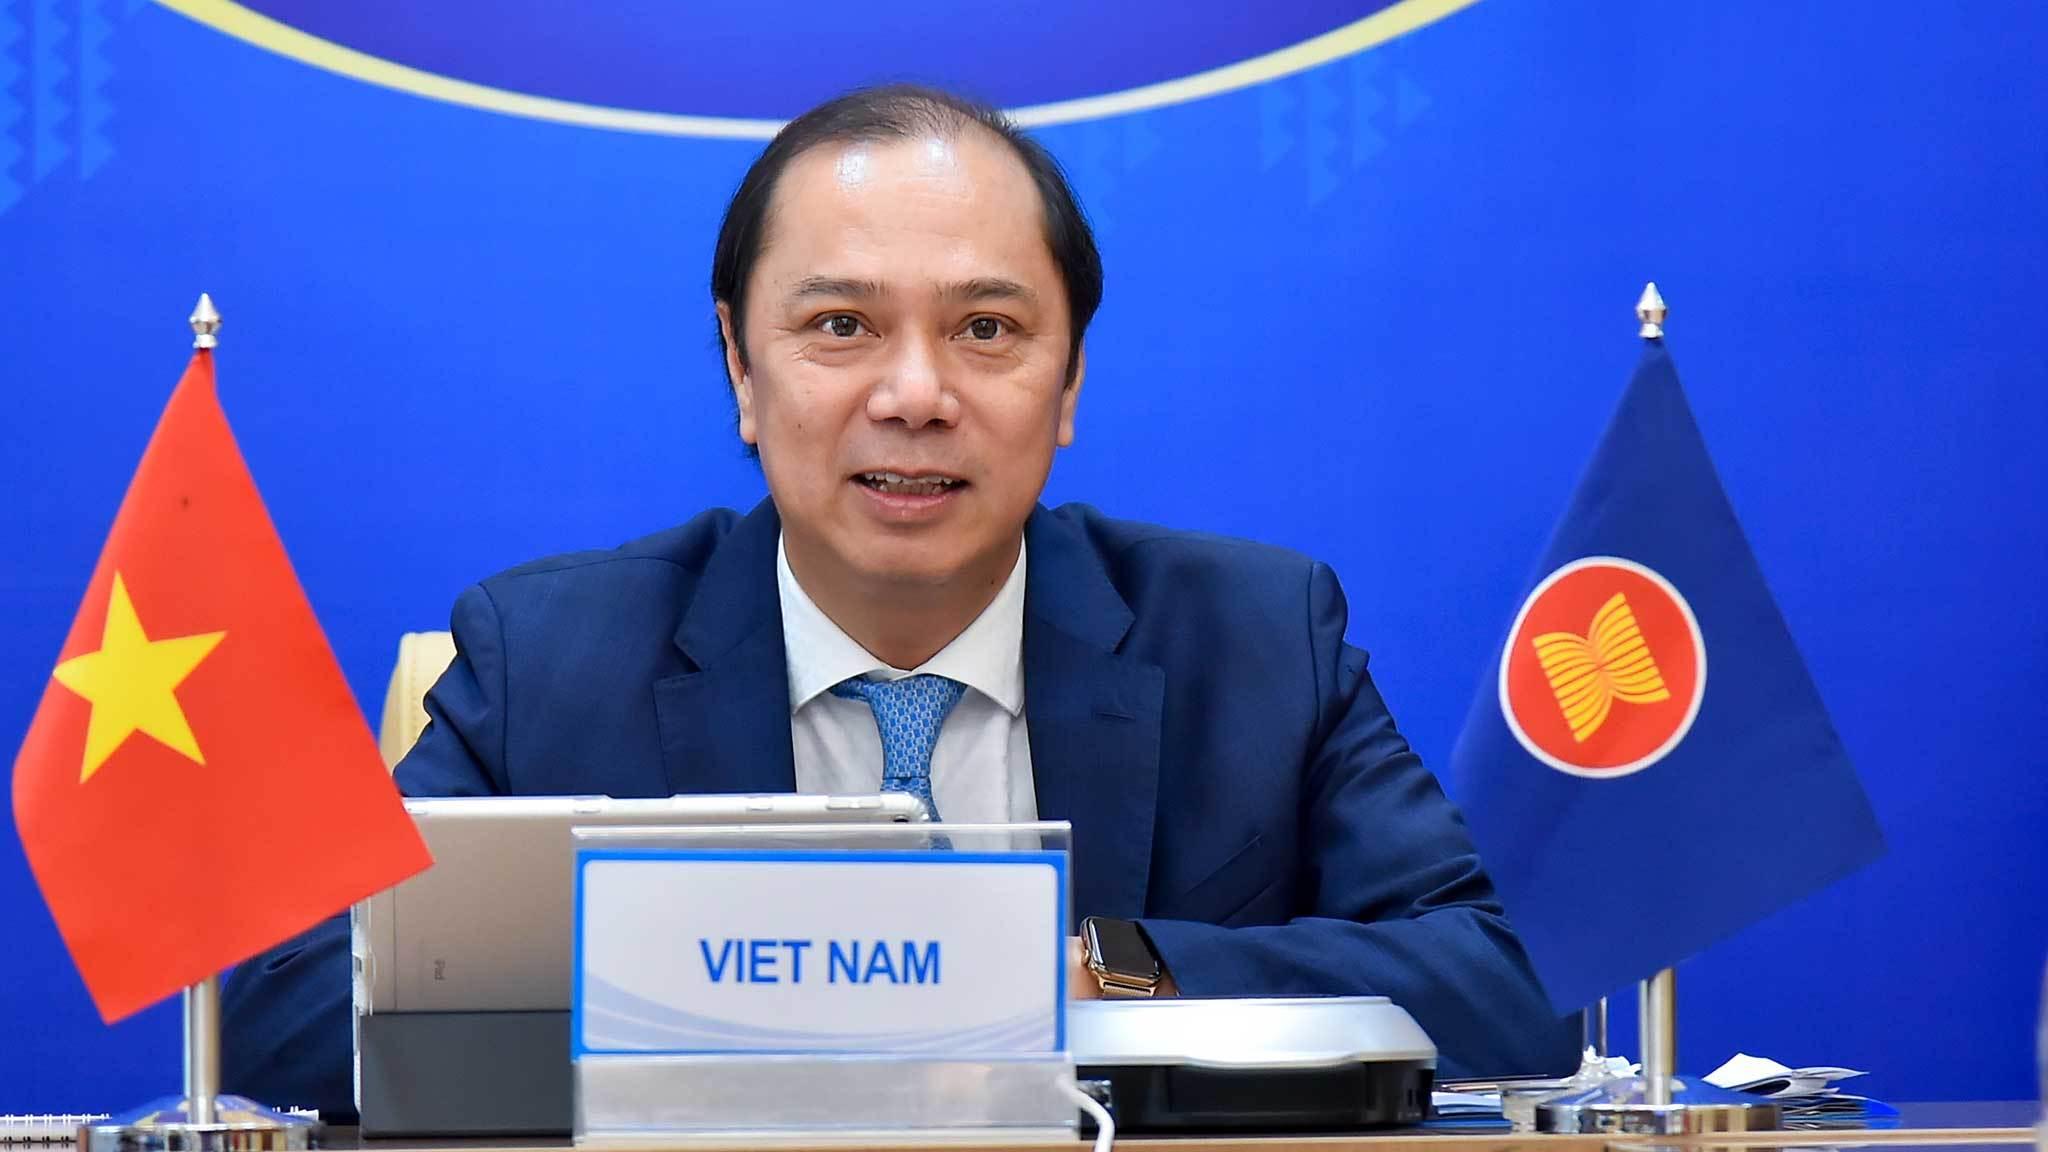 Việt Nam dự họp Tham vấn quan chức cao cấp ASEAN - Trung Quốc